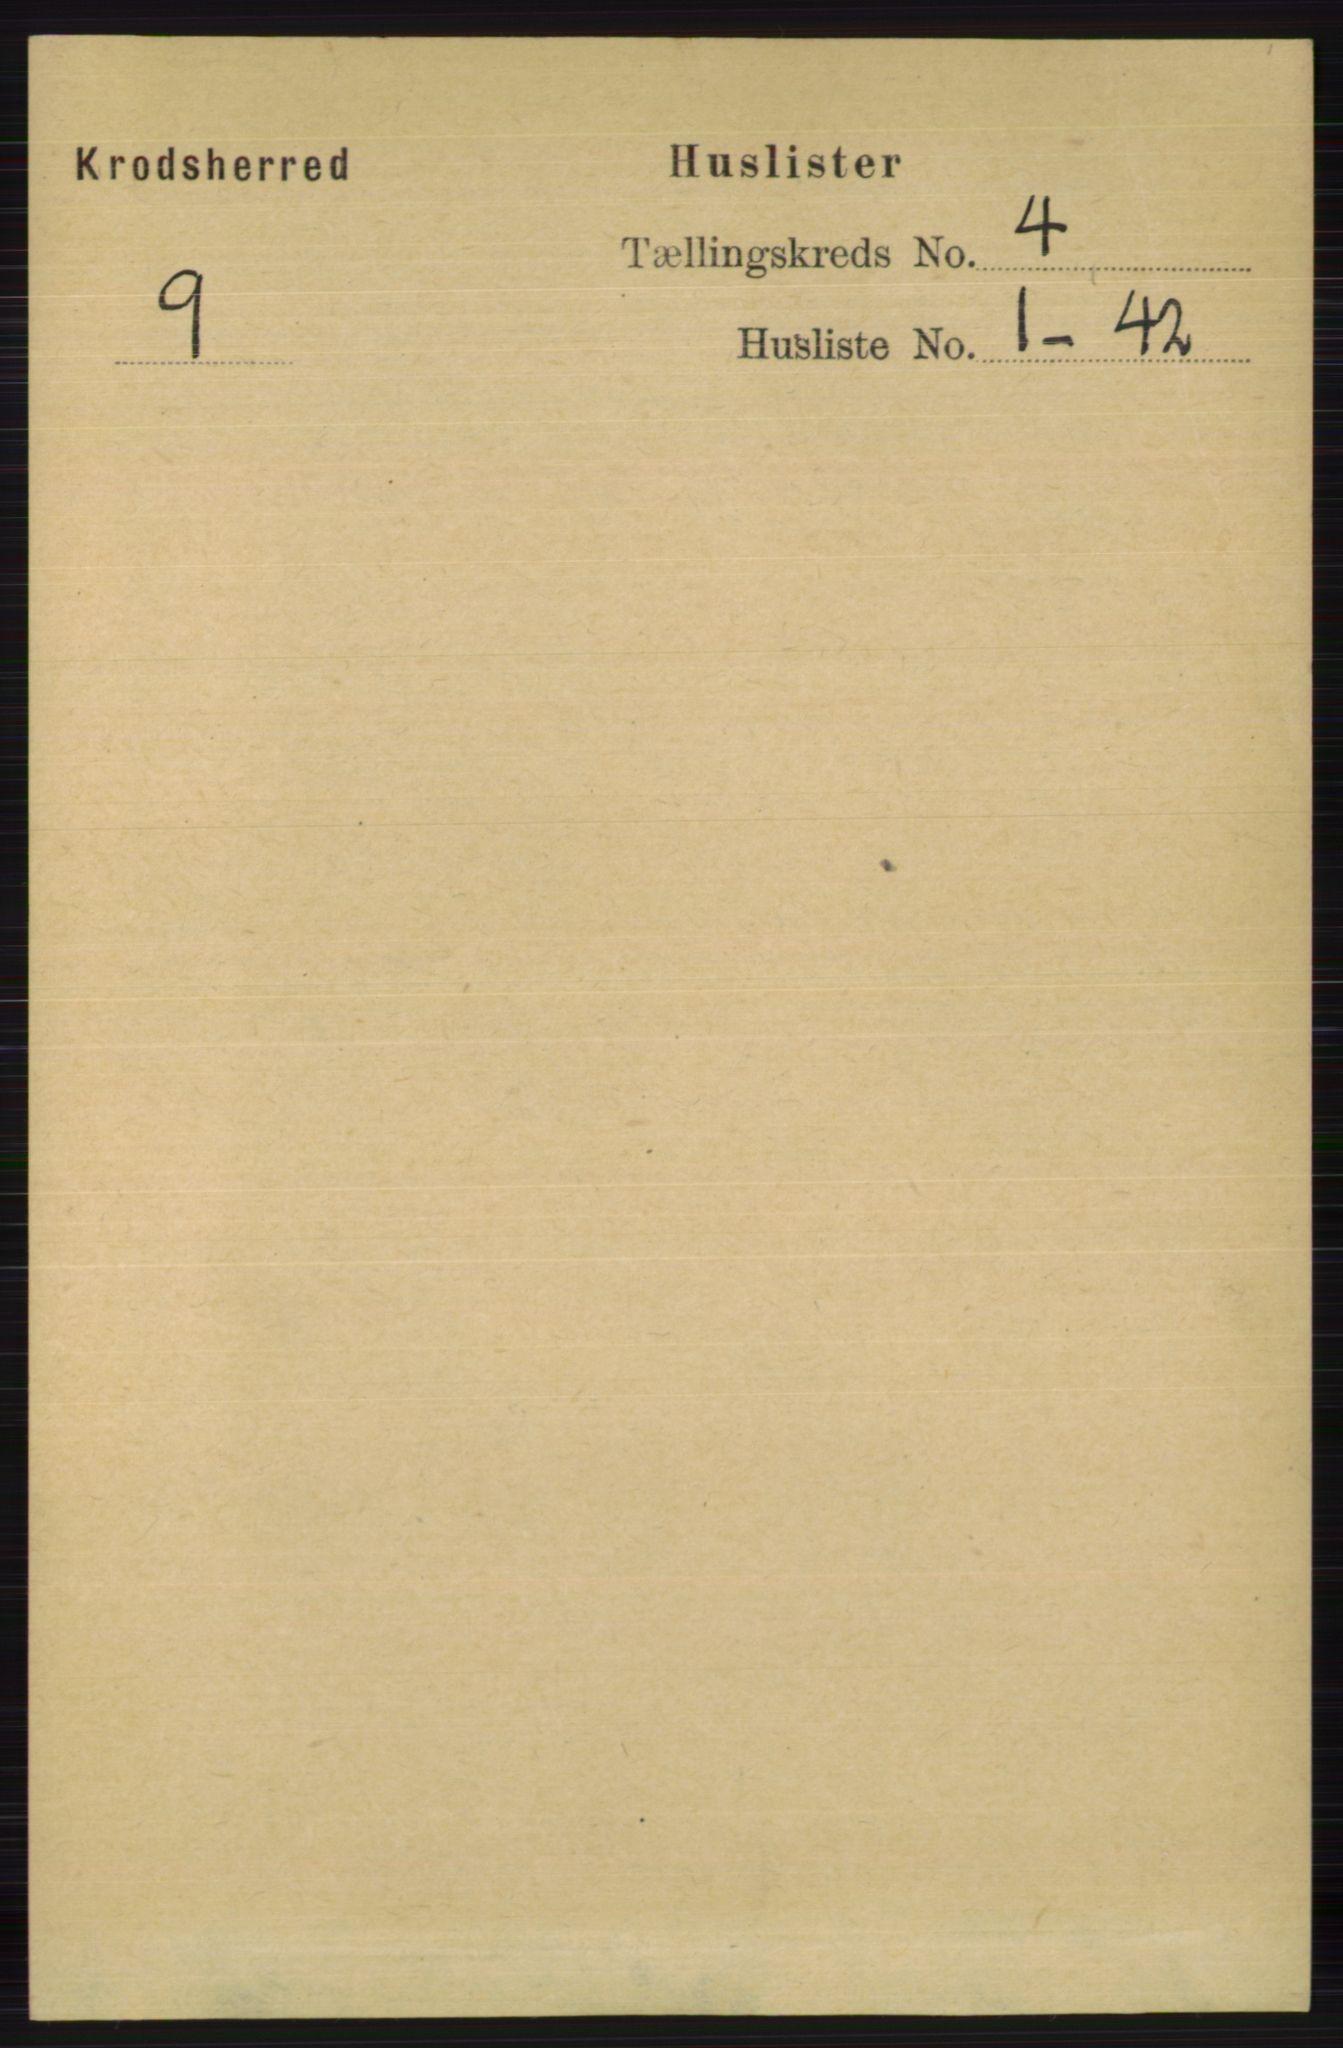 RA, Folketelling 1891 for 0621 Sigdal herred, 1891, s. 5951